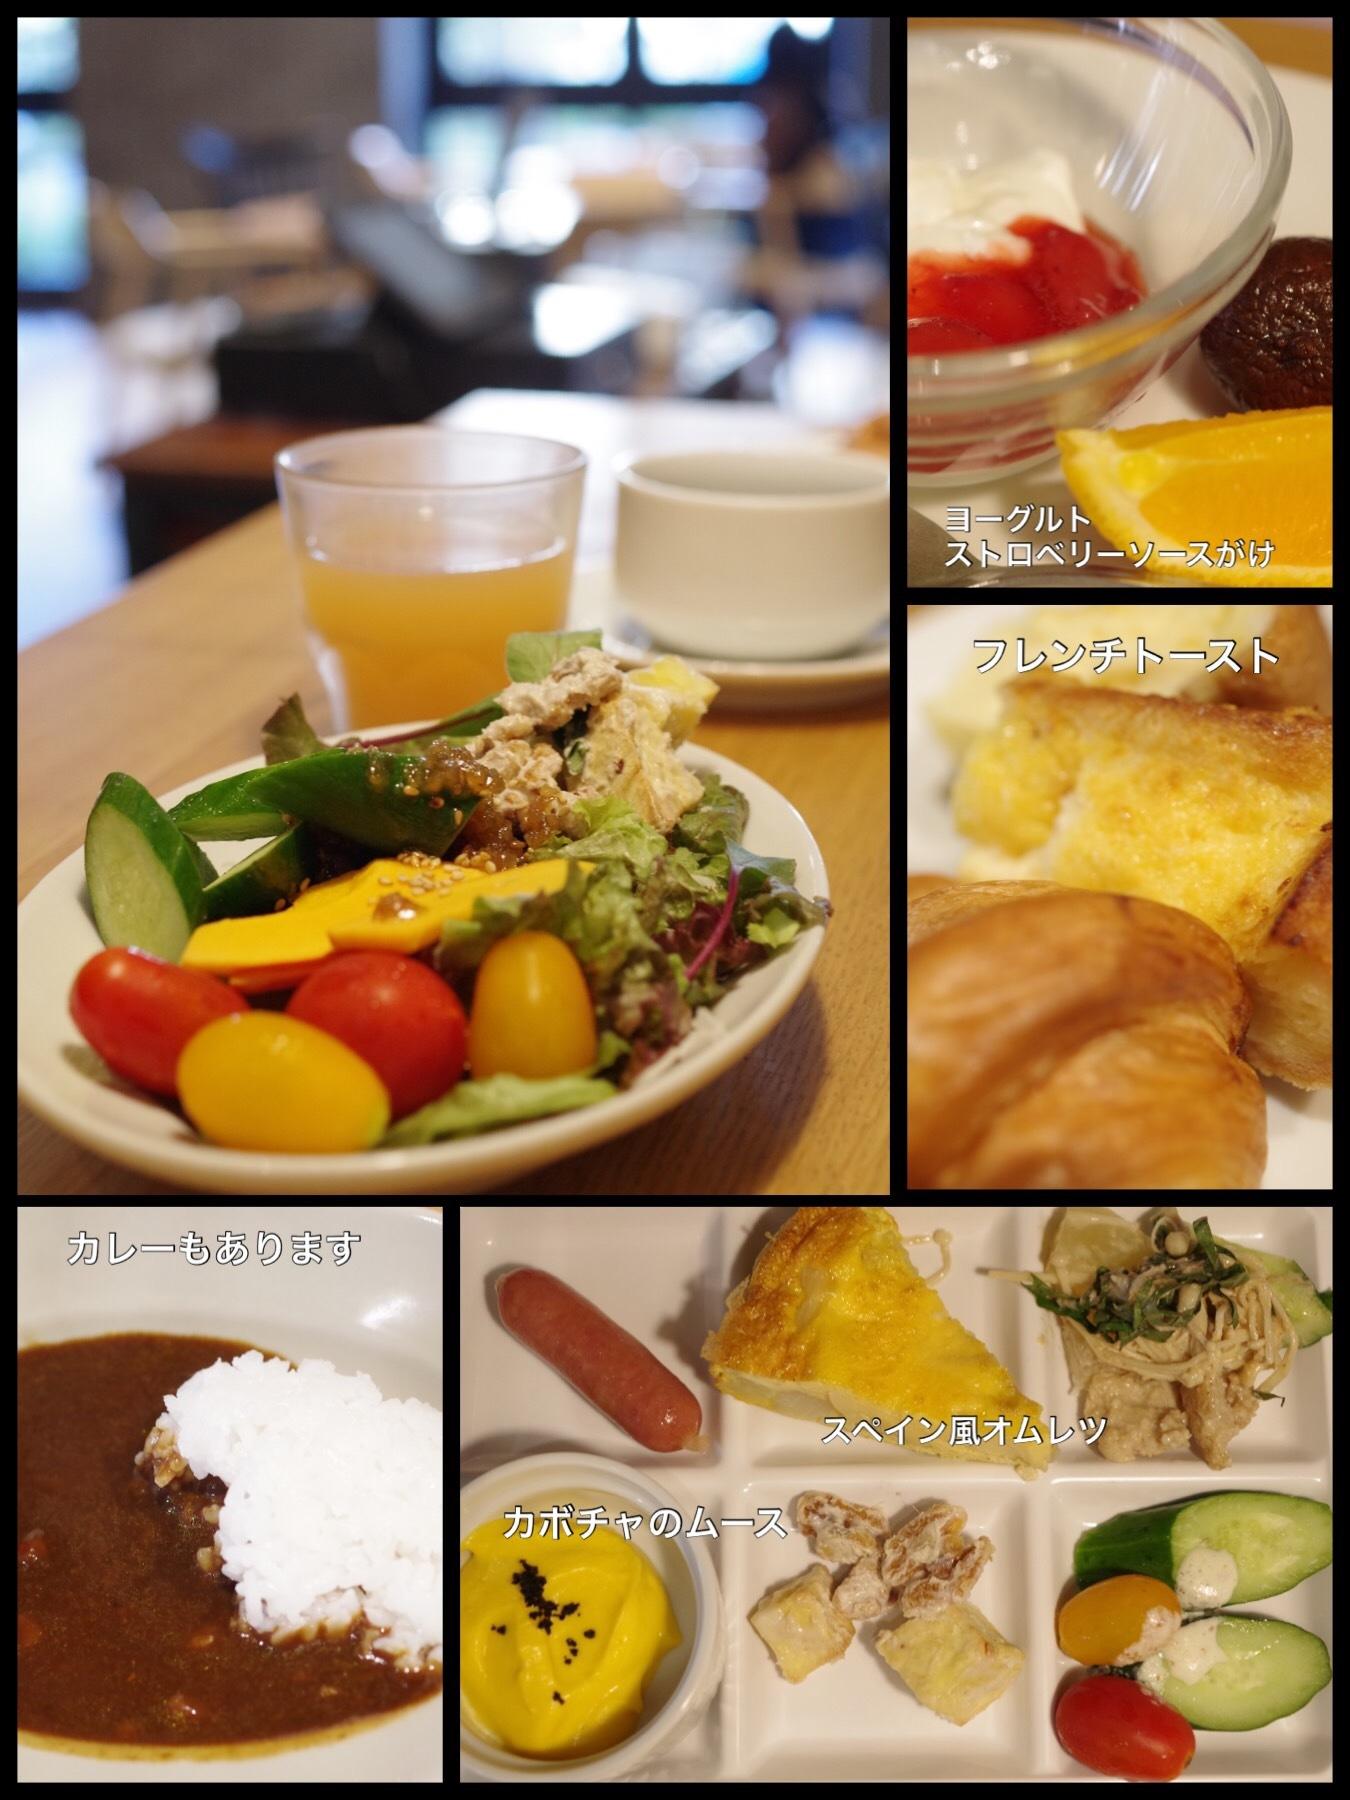 RAGOUT AND WHISKY HOUSE「ラグーアンドウイスキーハウス」ホ テル エディット横濱 朝食